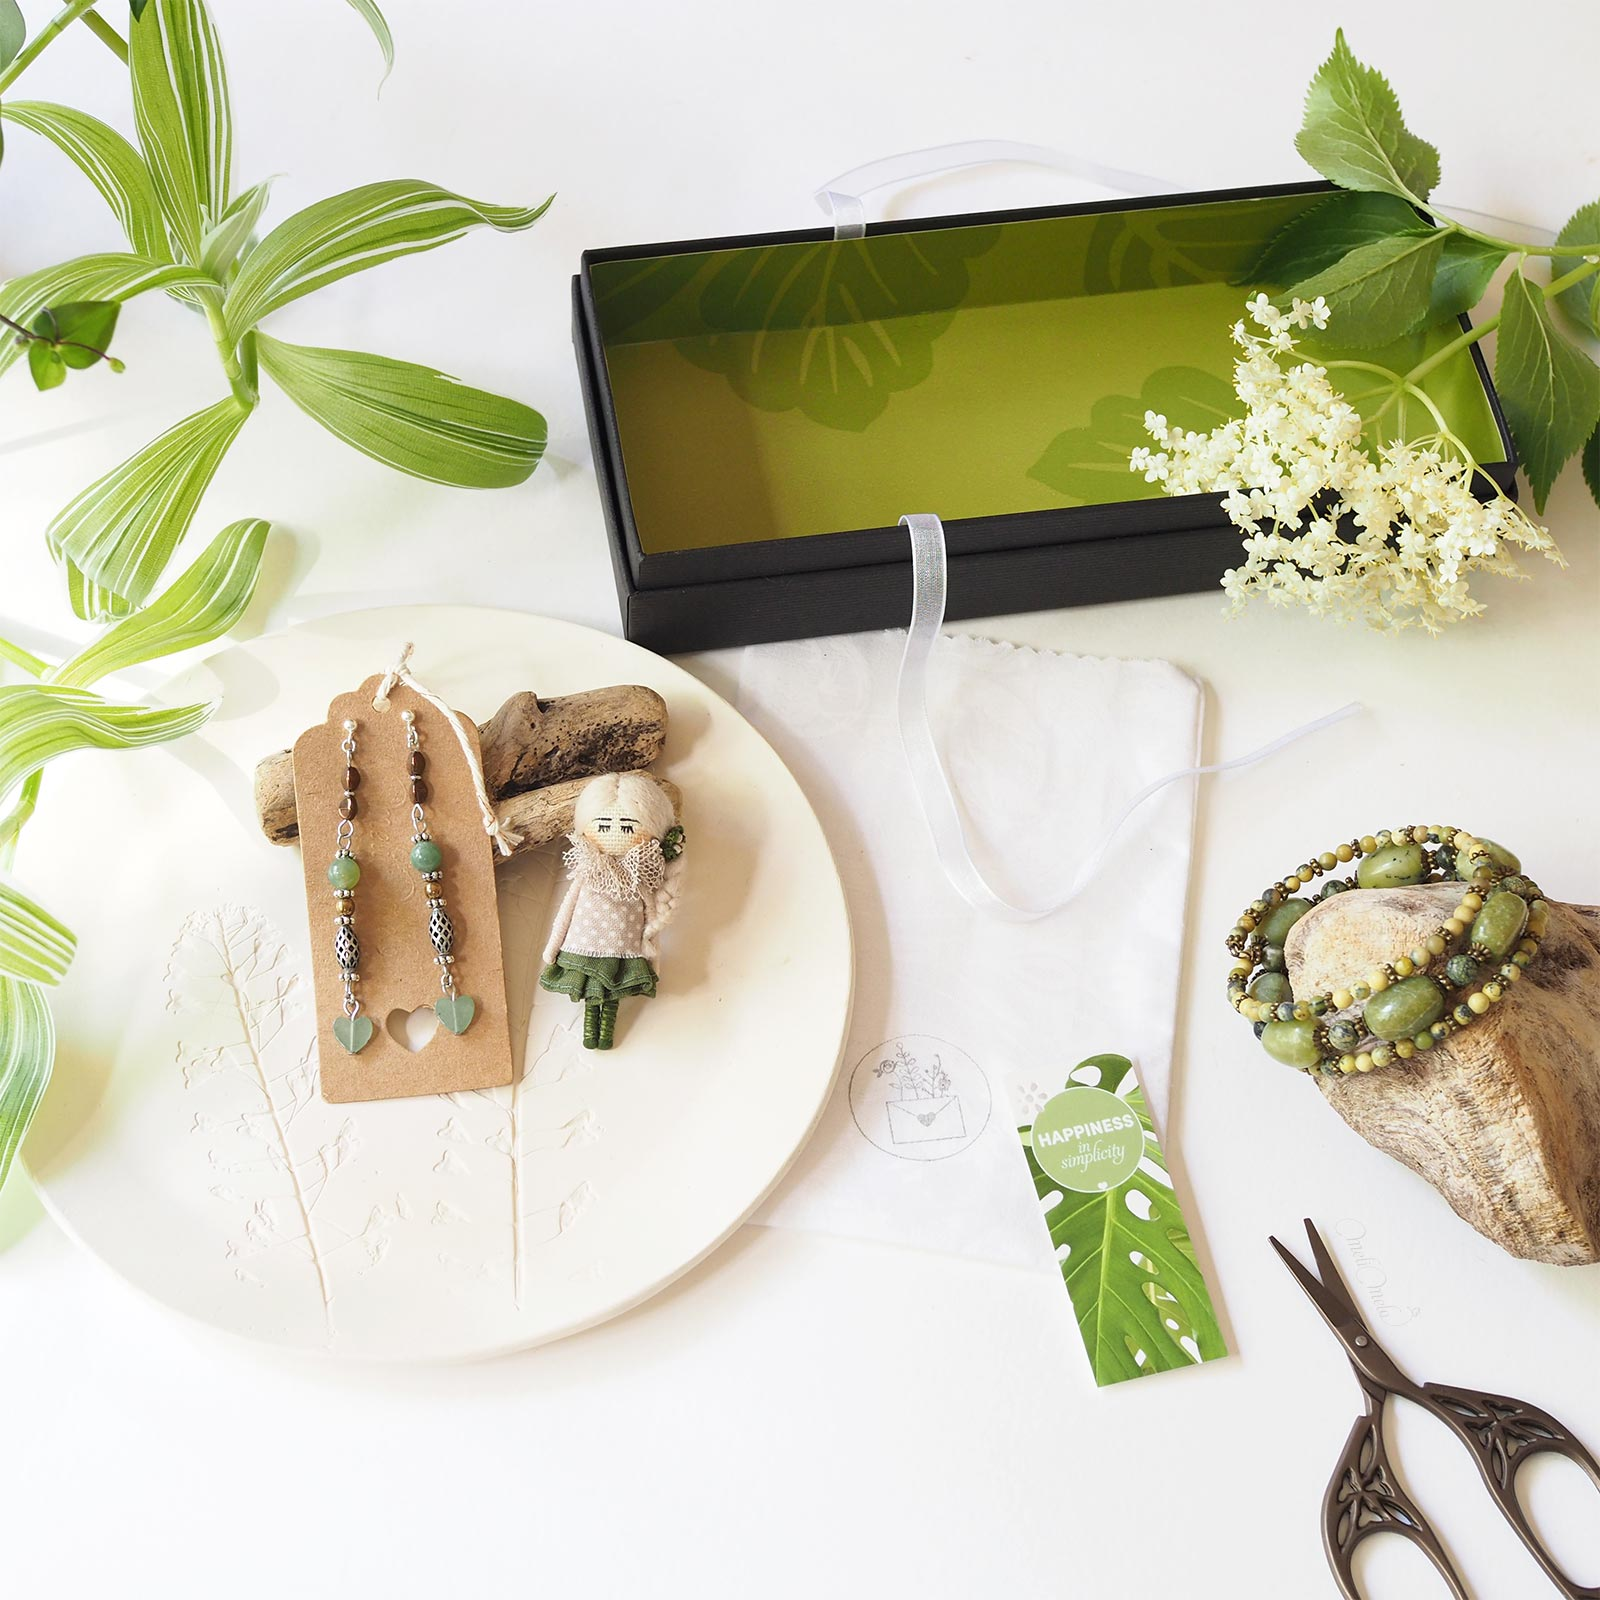 bijoux bohême green gemmes jade jaspe vert mookaïte aventurine broche poupee laboutiquedemelimelo